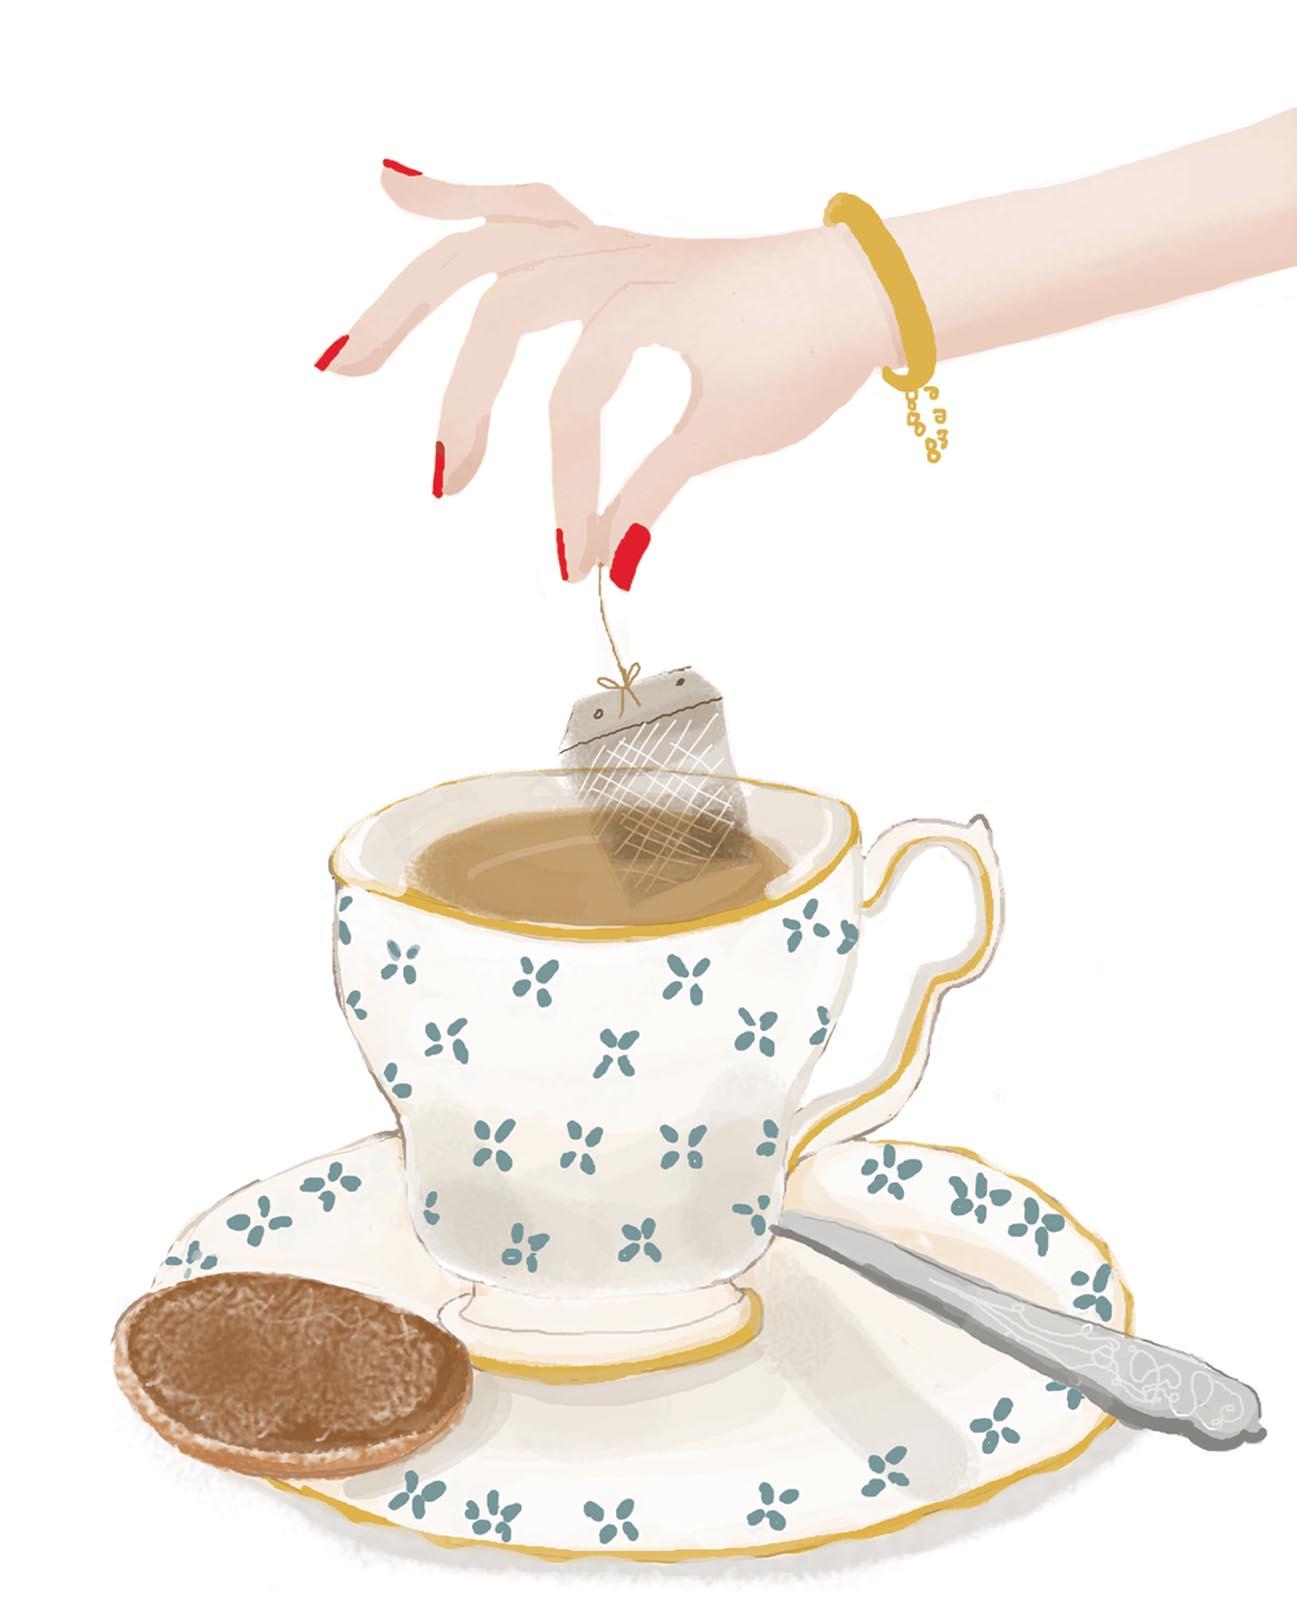 Pin by *Corinne B* on *Le temps d'un thé ~ Tea time 2*.